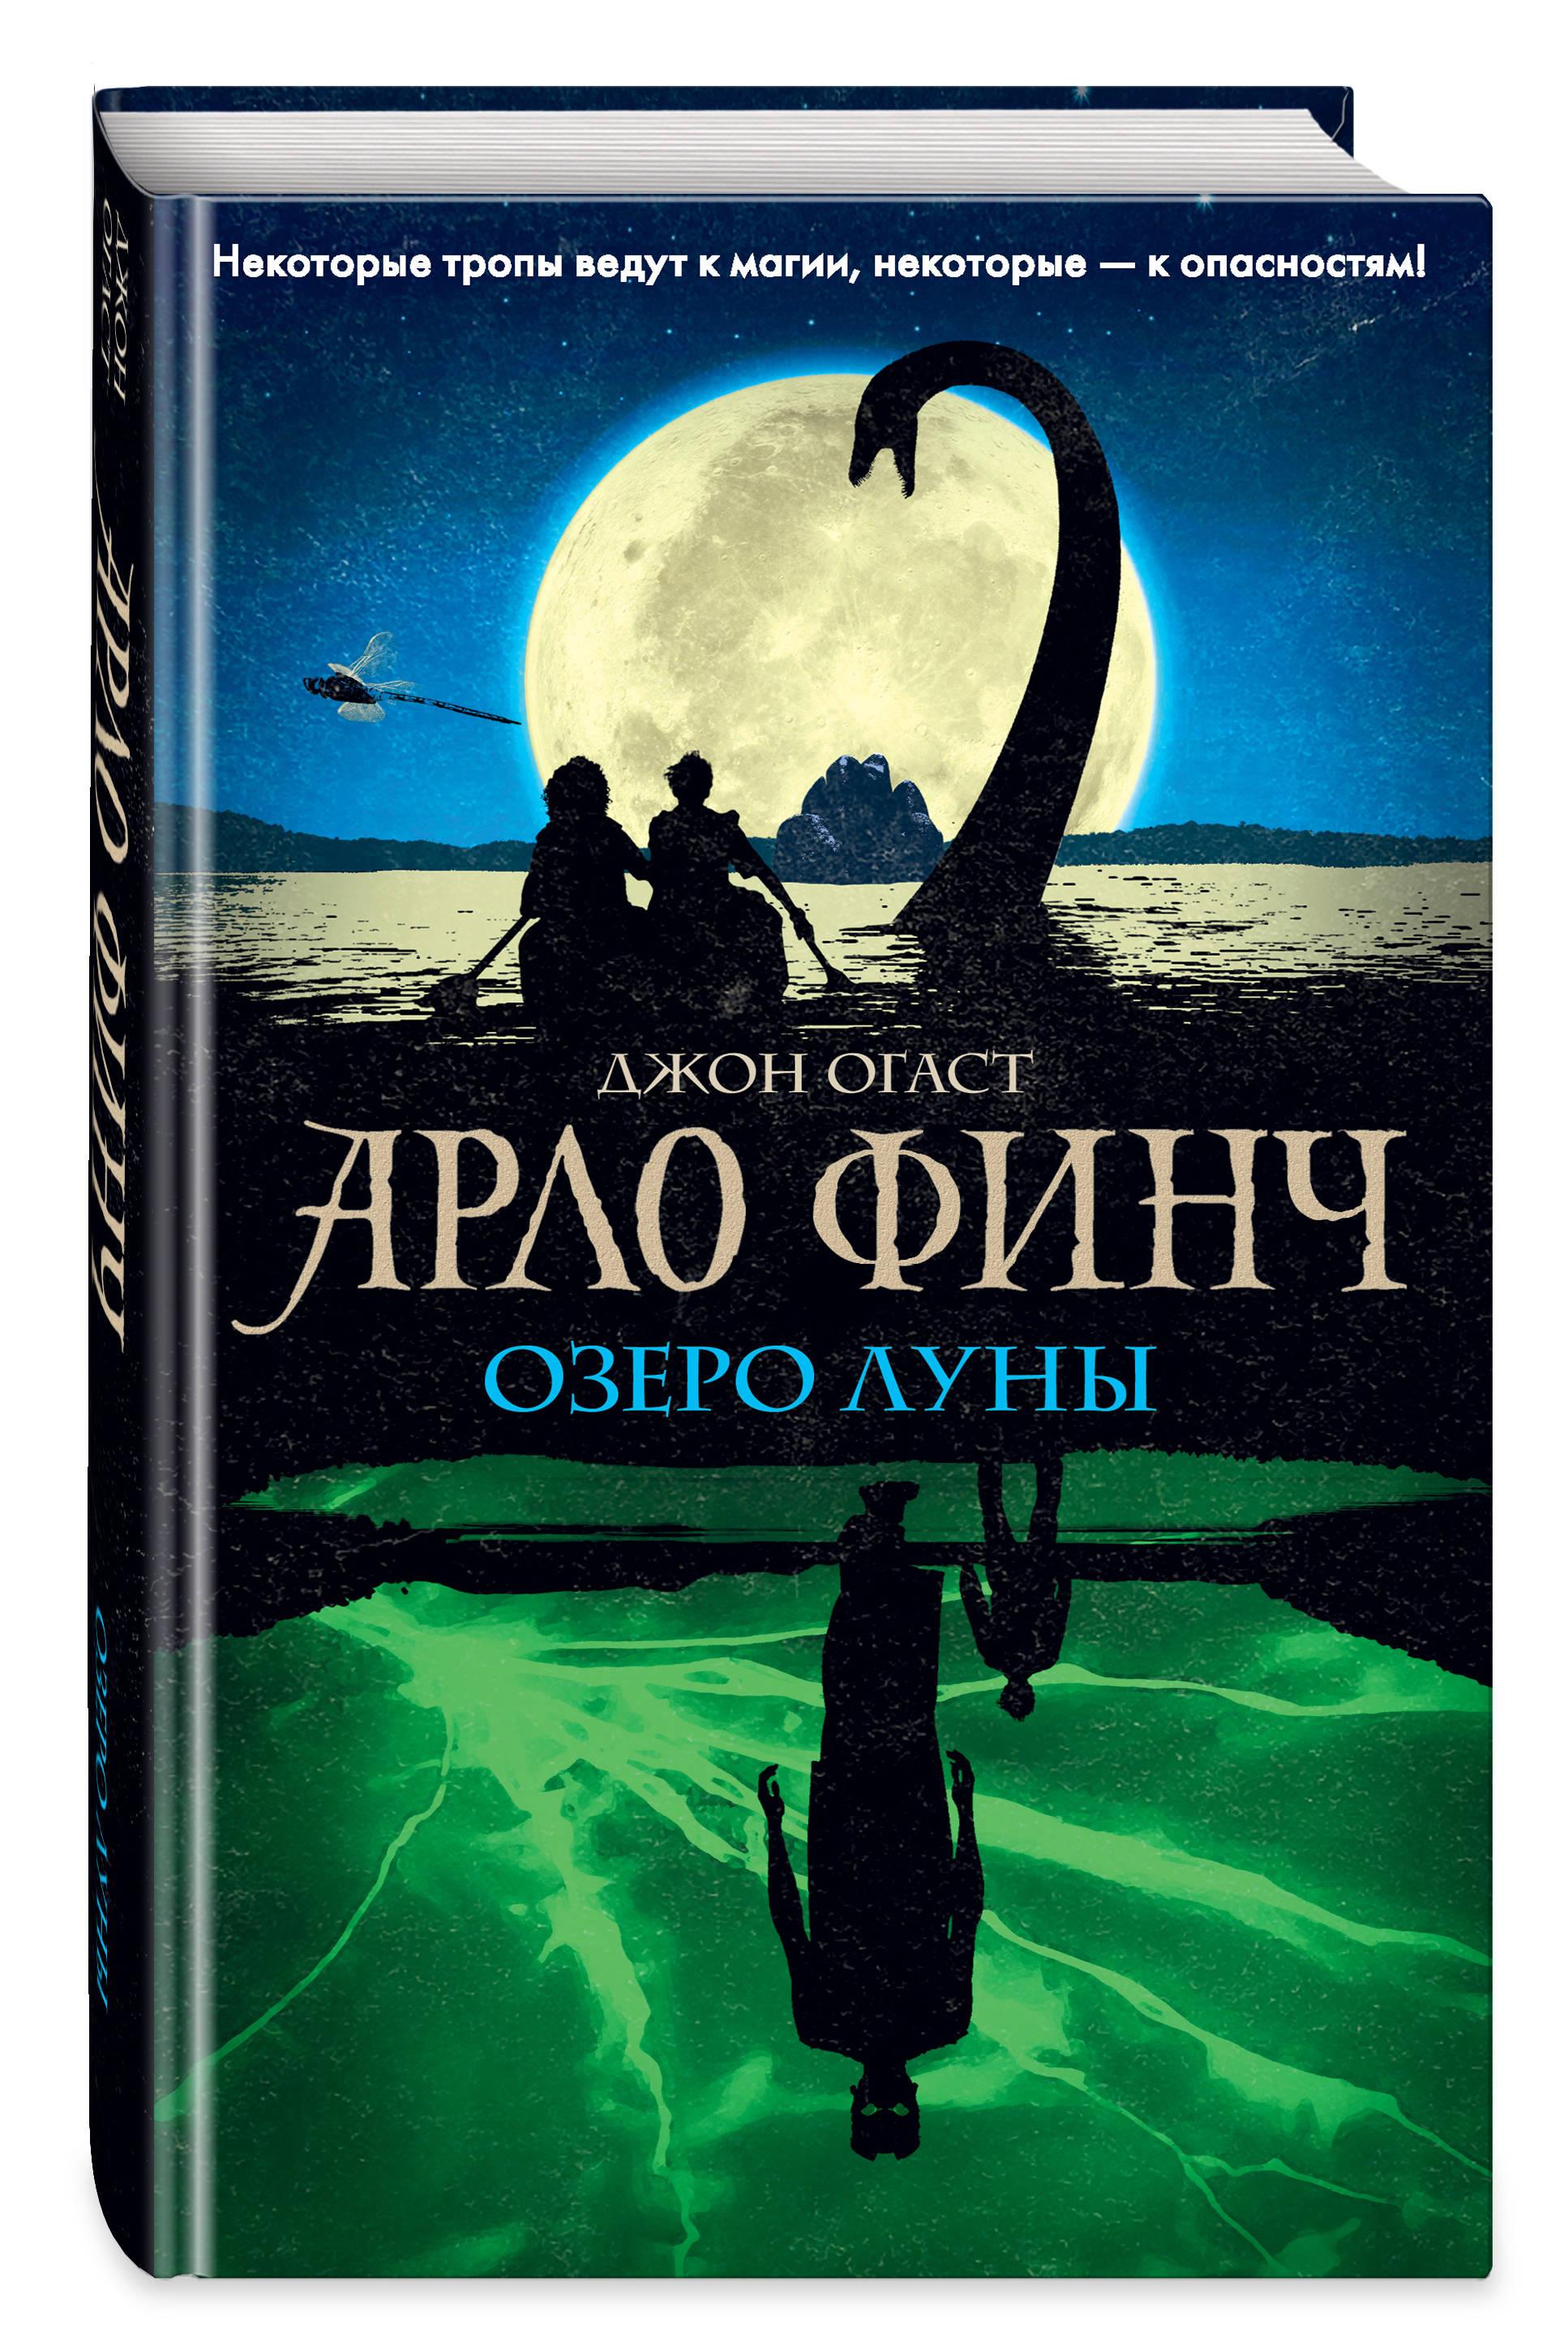 Арло Финч. Озеро Луны (#2)